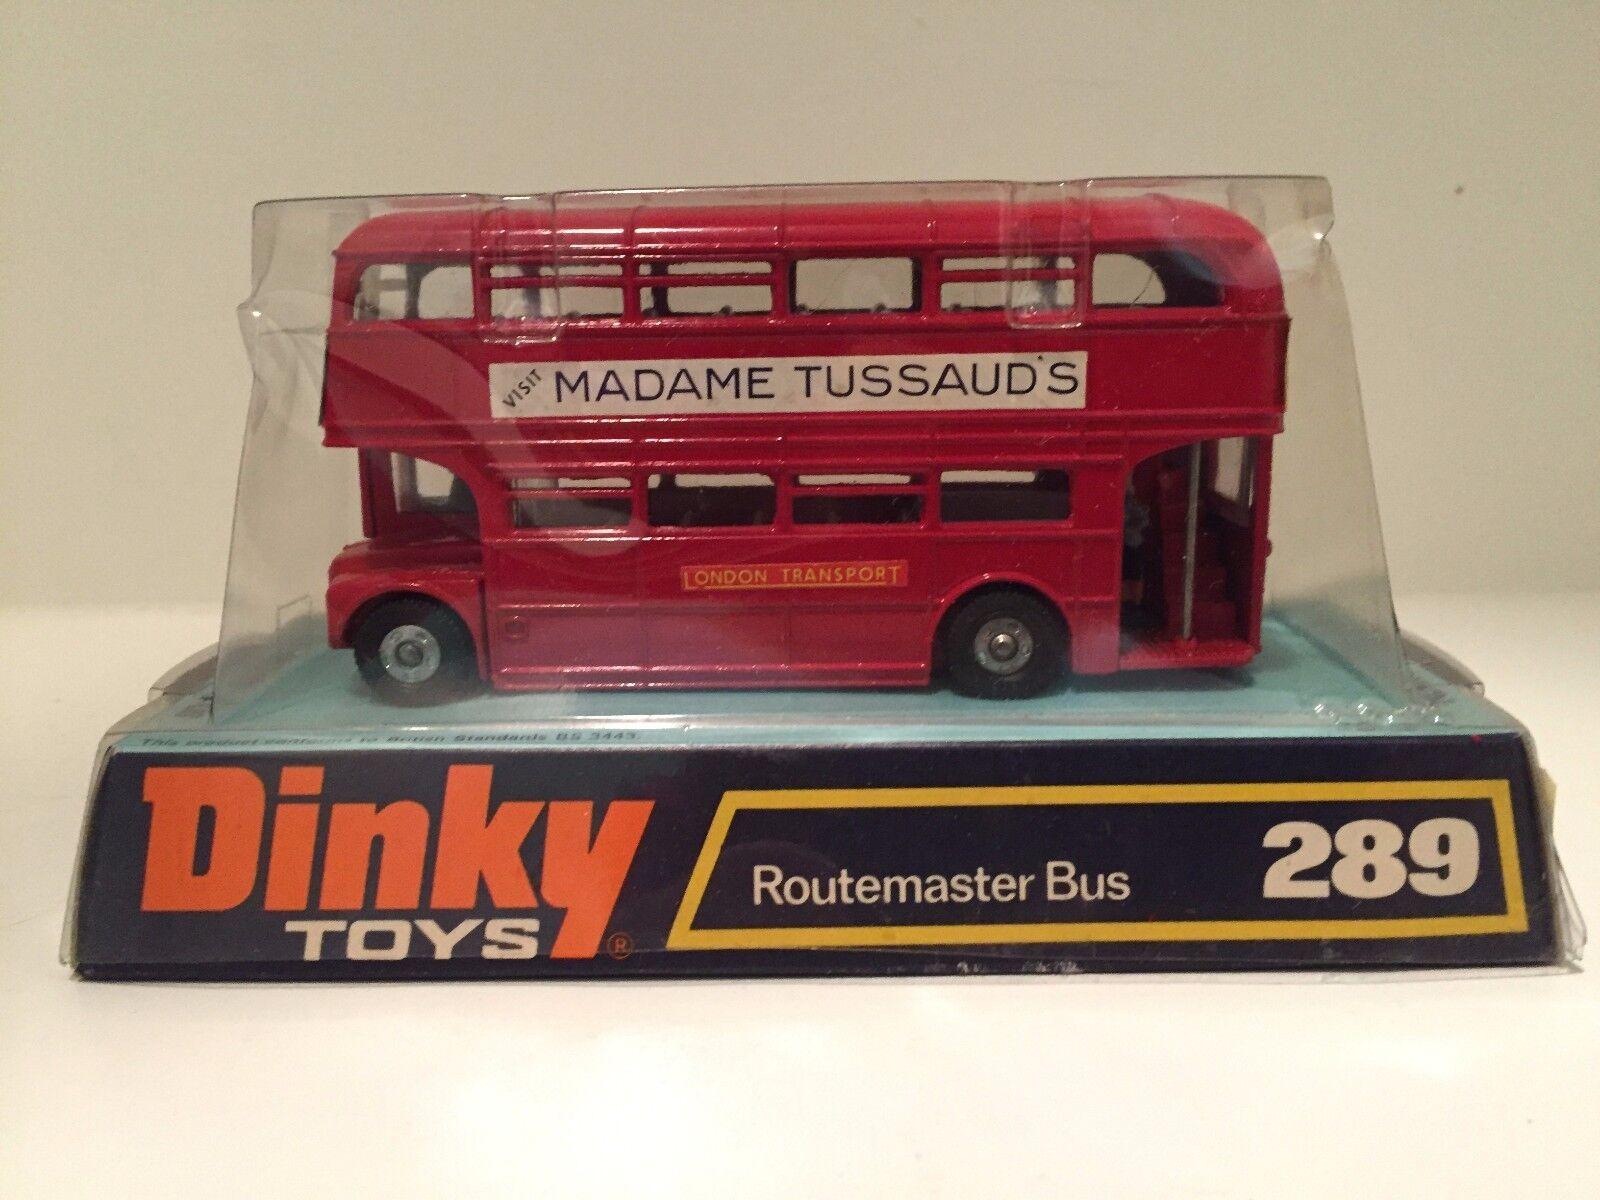 Meccano dinky spielzeug 289 routemaster - bus madame tussaud 's vintage - kings cross